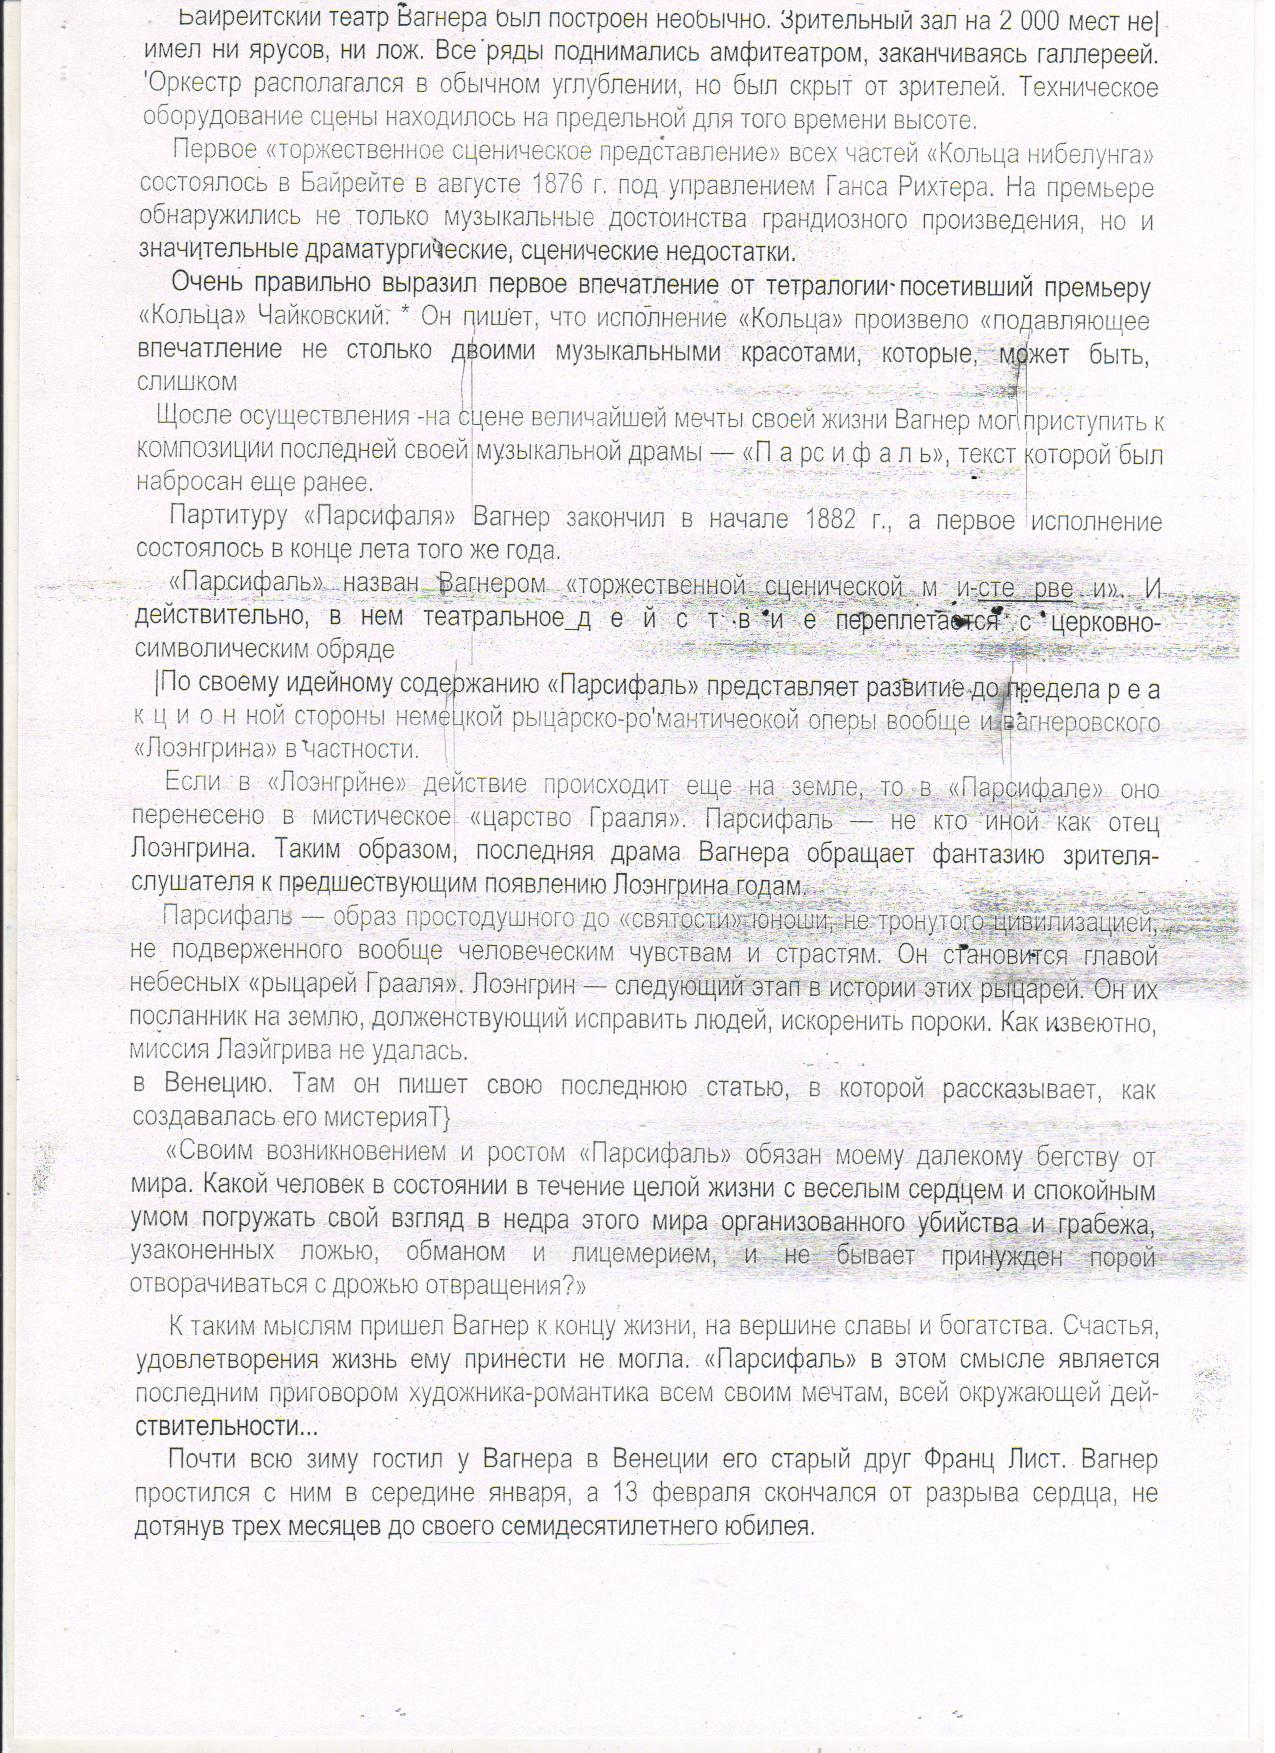 C:\Documents and Settings\Учитель\Рабочий стол\10.jpg